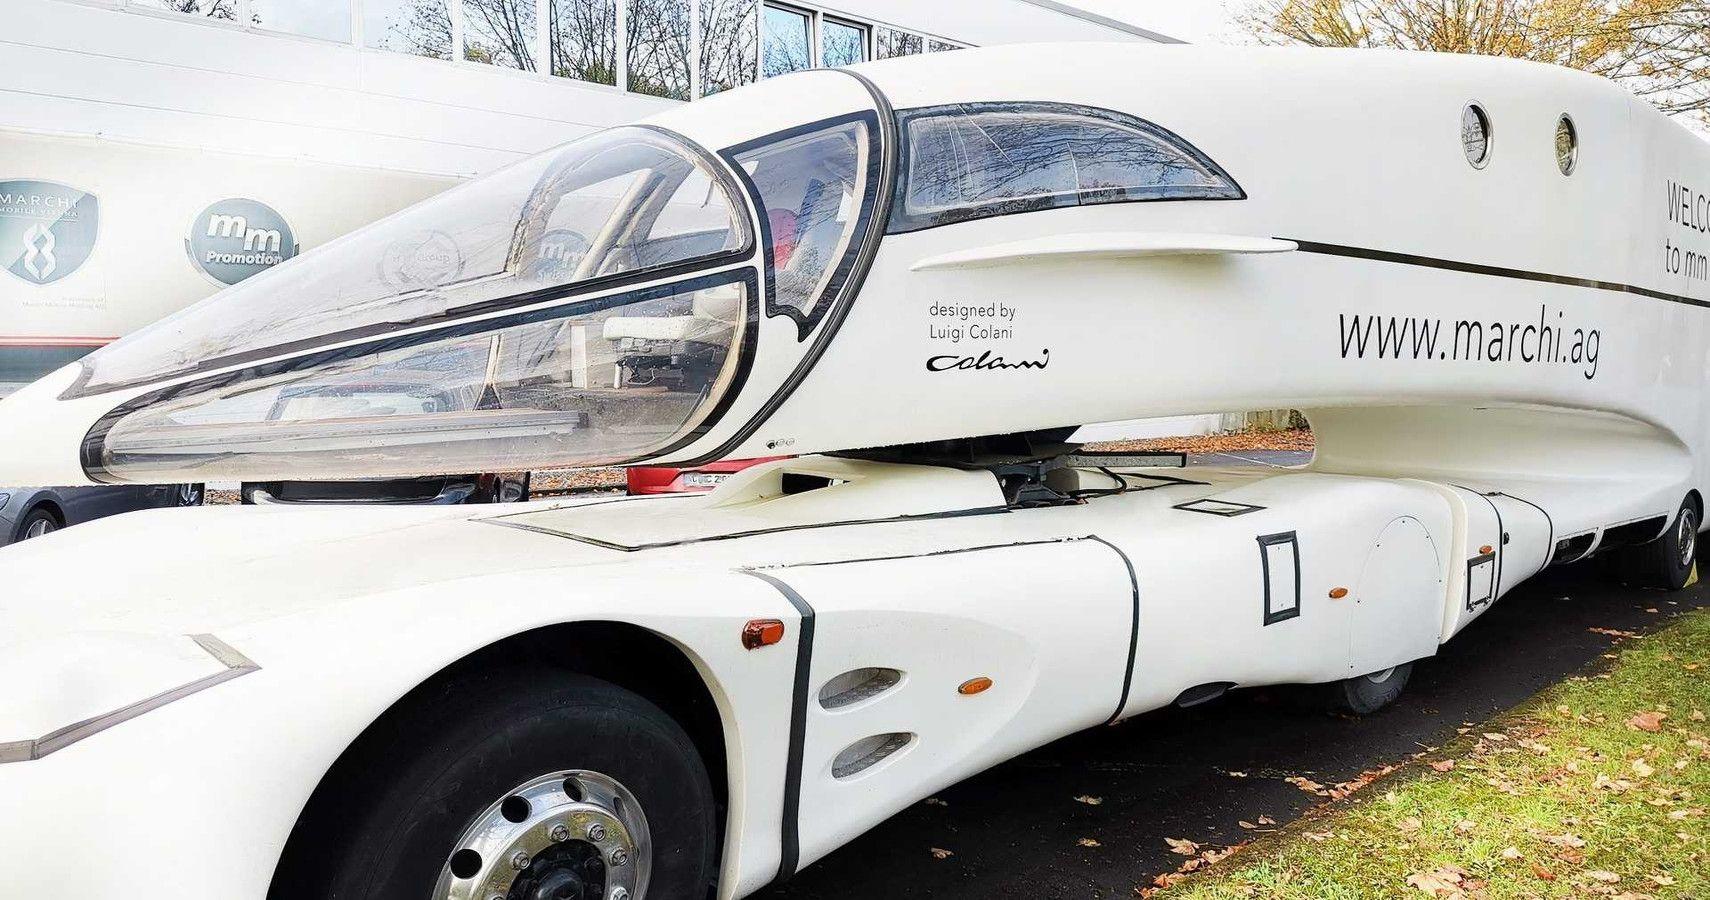 Innotruck Futuristic Concept Spearheaded Electric Truck Tech